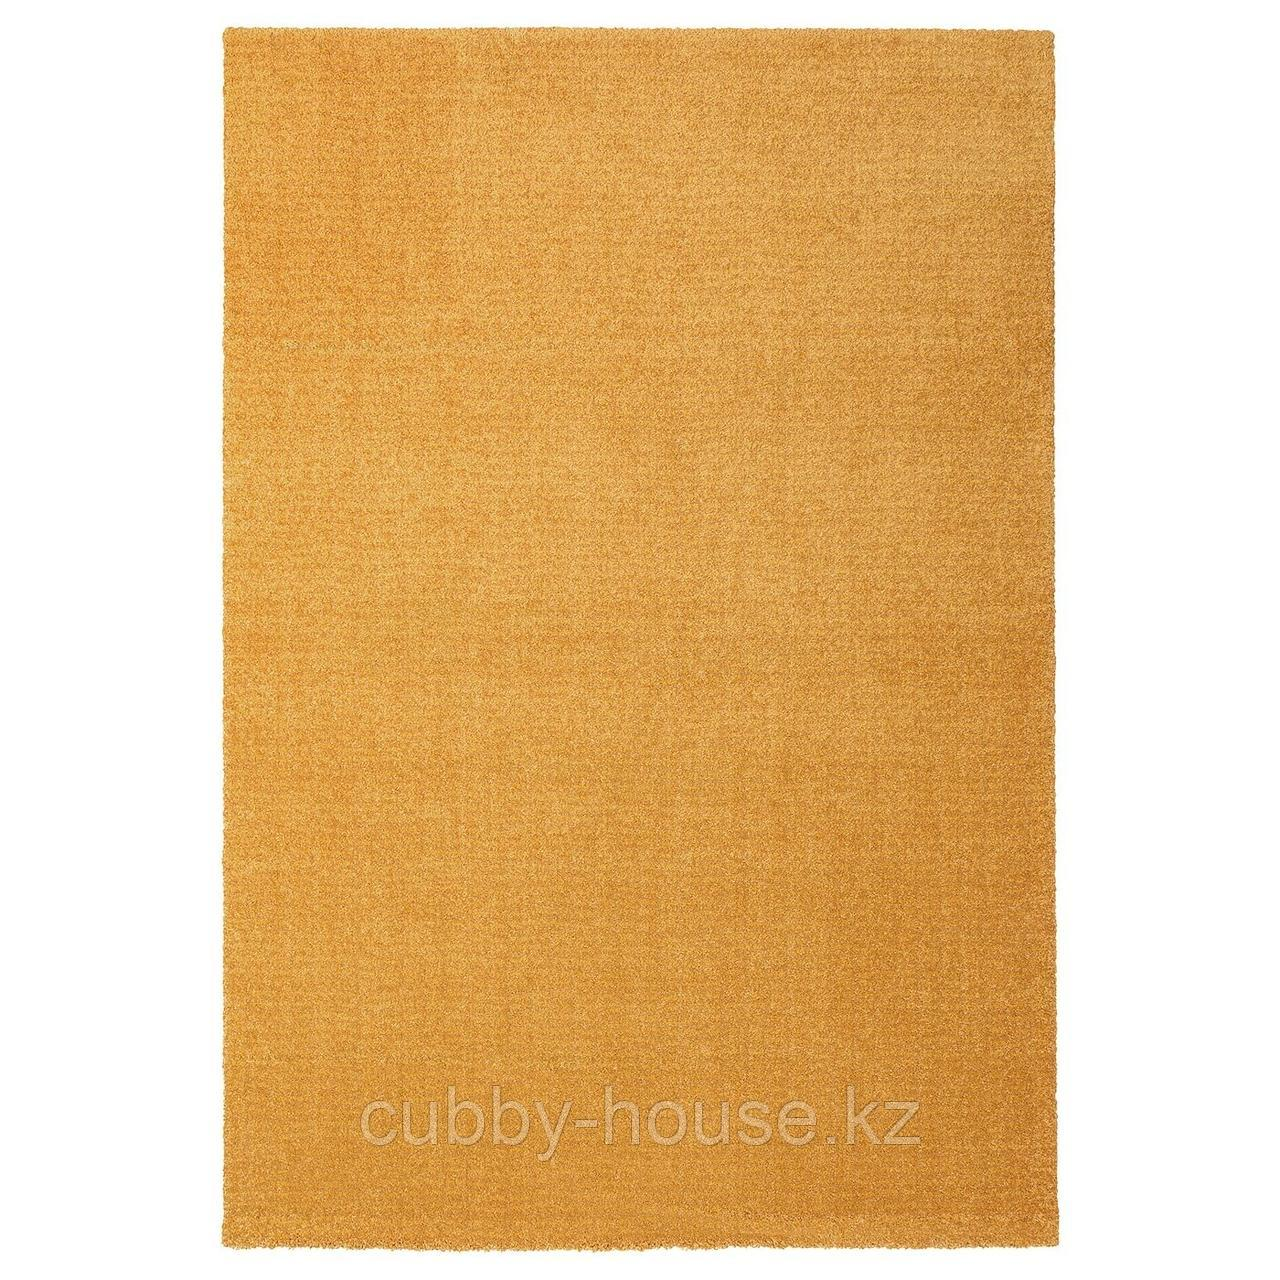 ЛАНГСТЕД Ковер, короткий ворс, желтый, 133x195 см